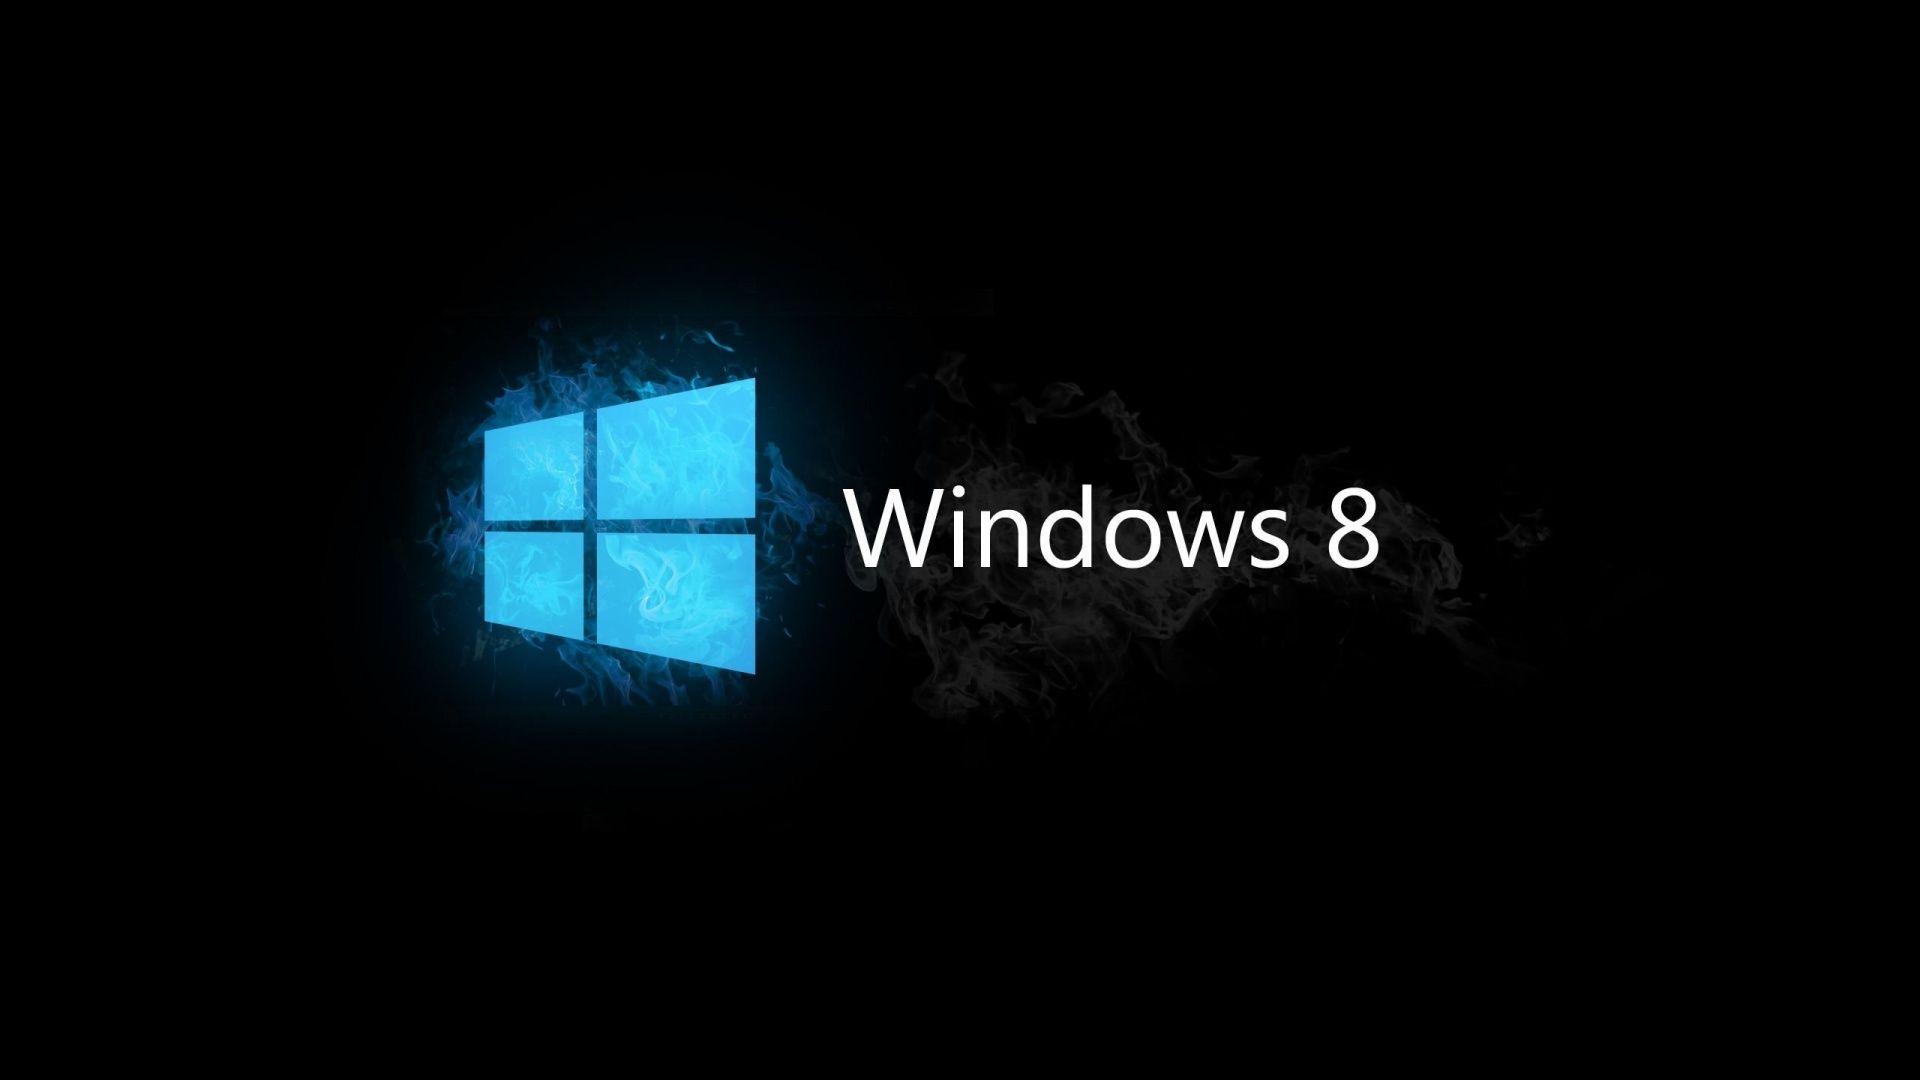 Windows 8 Logo Hd Wallpaper Windows 8 Logo Ipicturee Com Windows Wallpaper Hd Wallpaper Desktop Windows 8